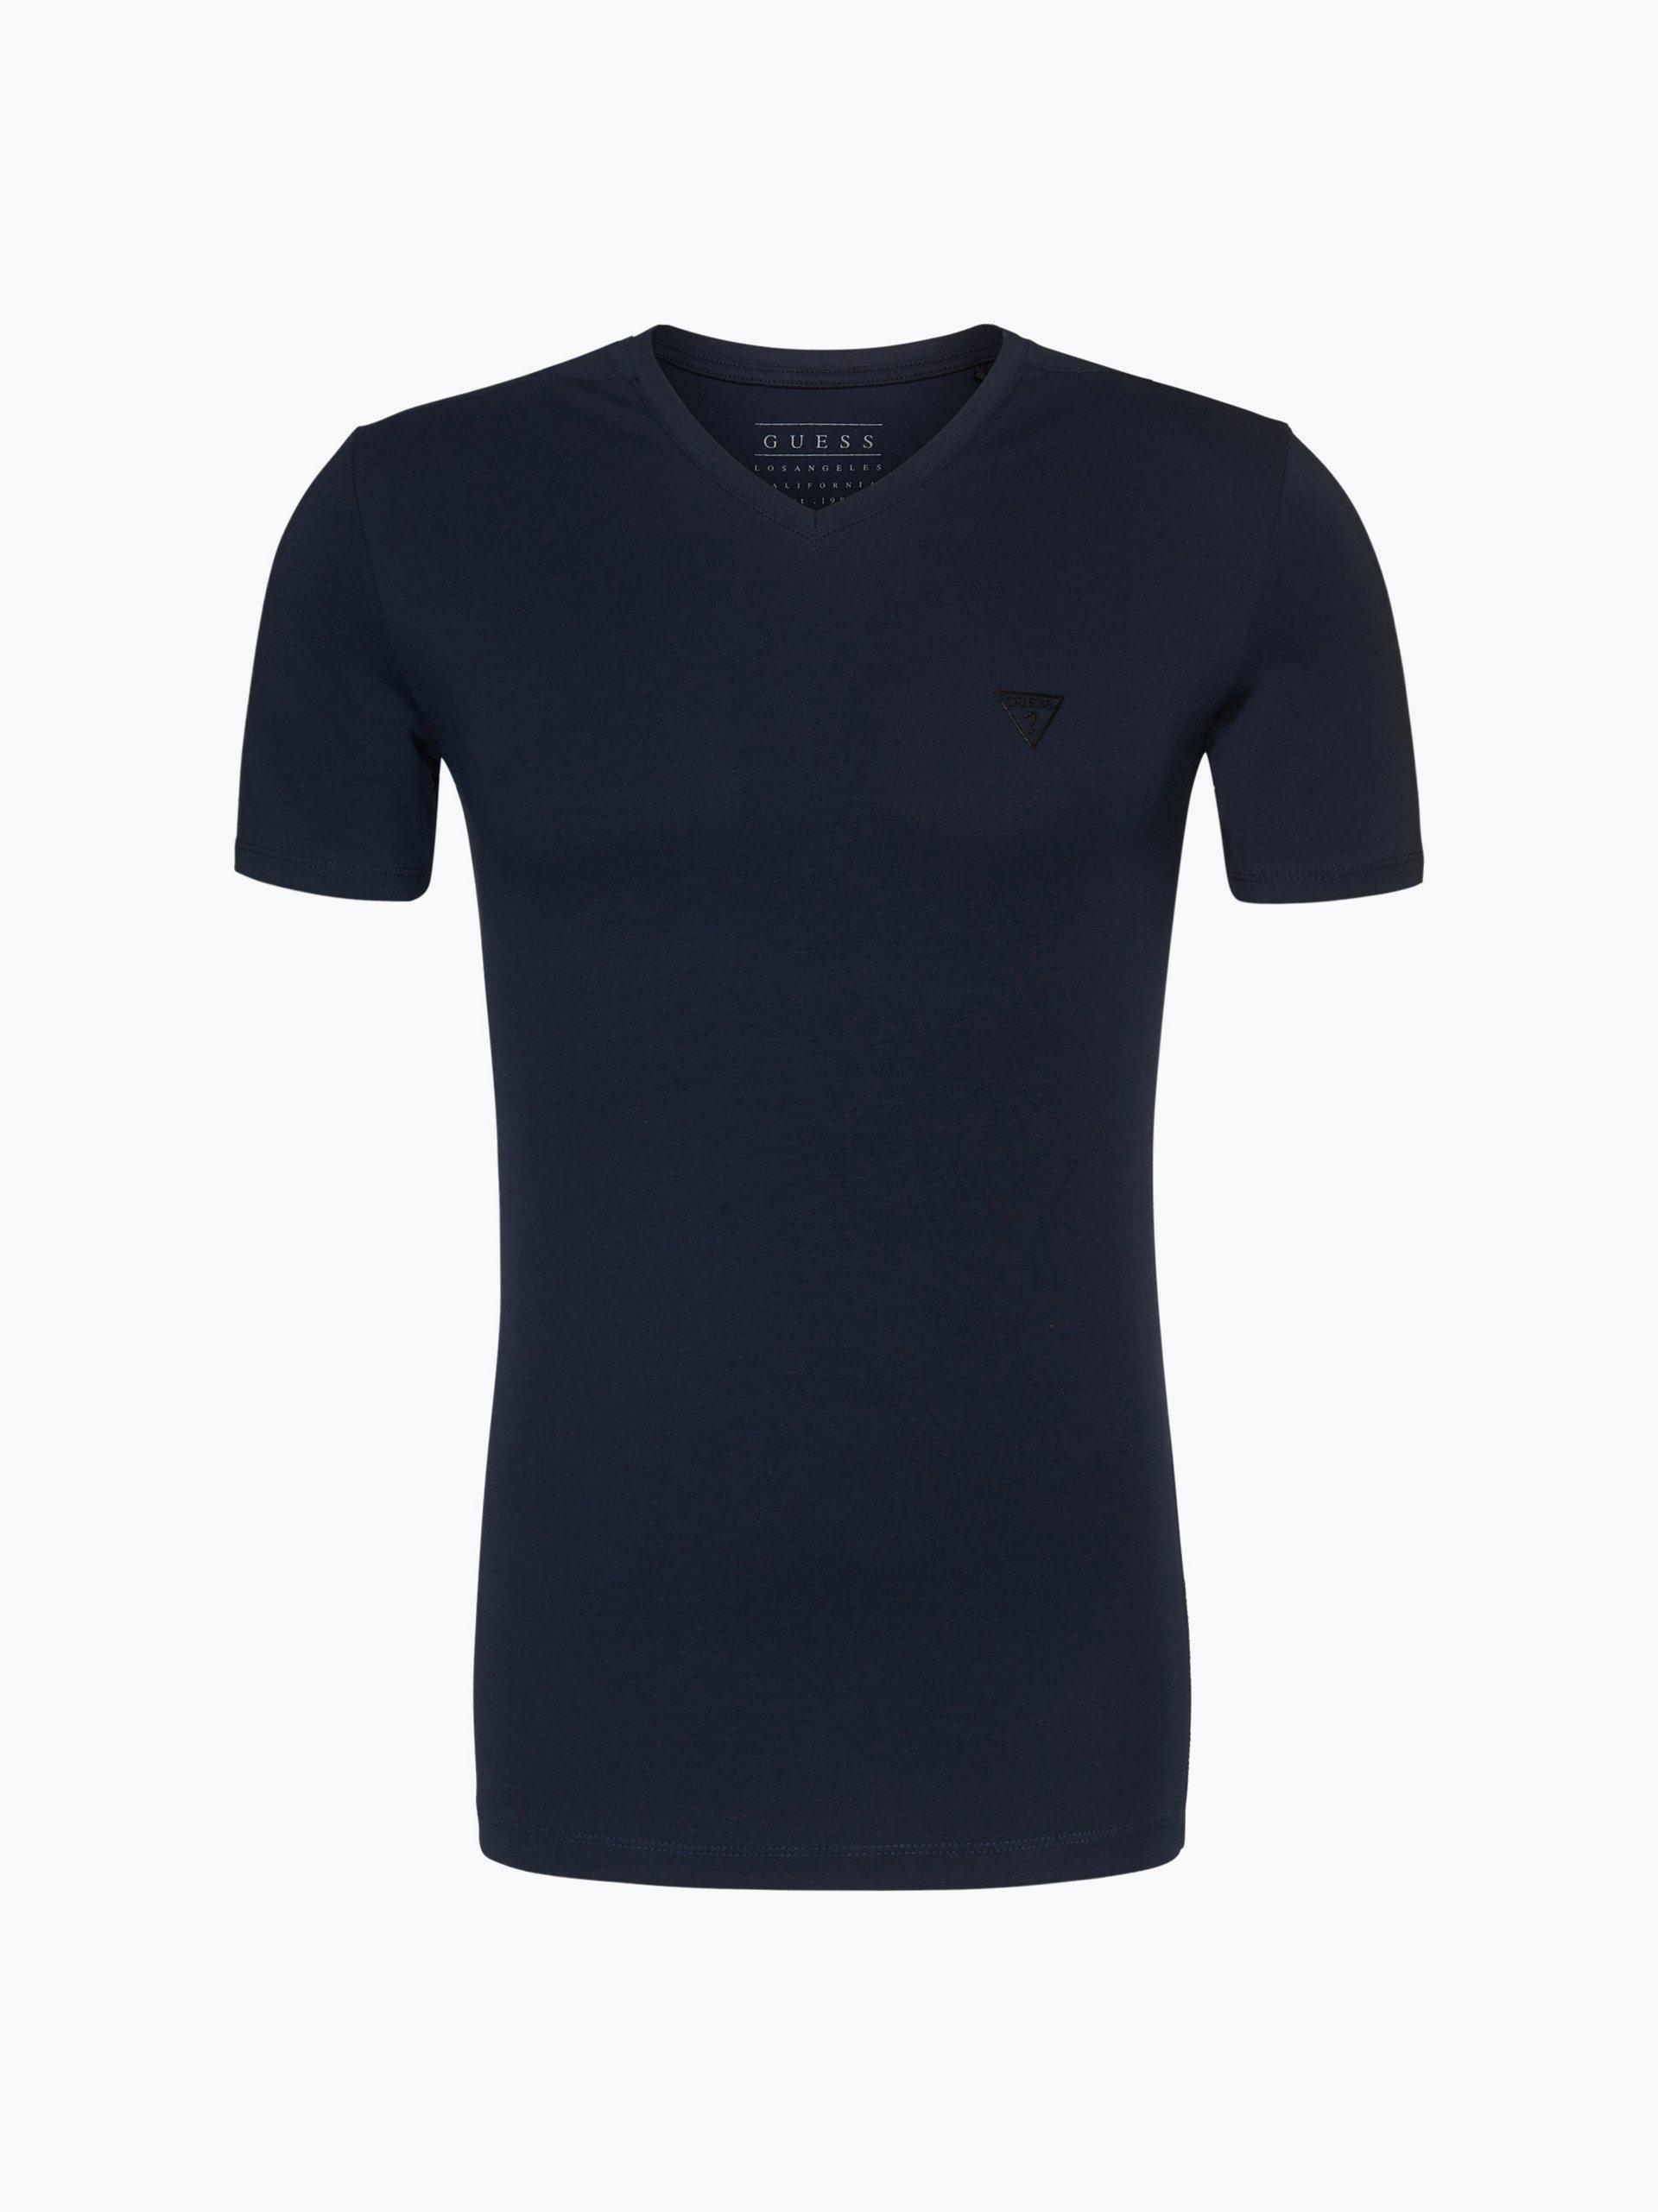 guess jeans herren t shirt marine gemustert online kaufen. Black Bedroom Furniture Sets. Home Design Ideas